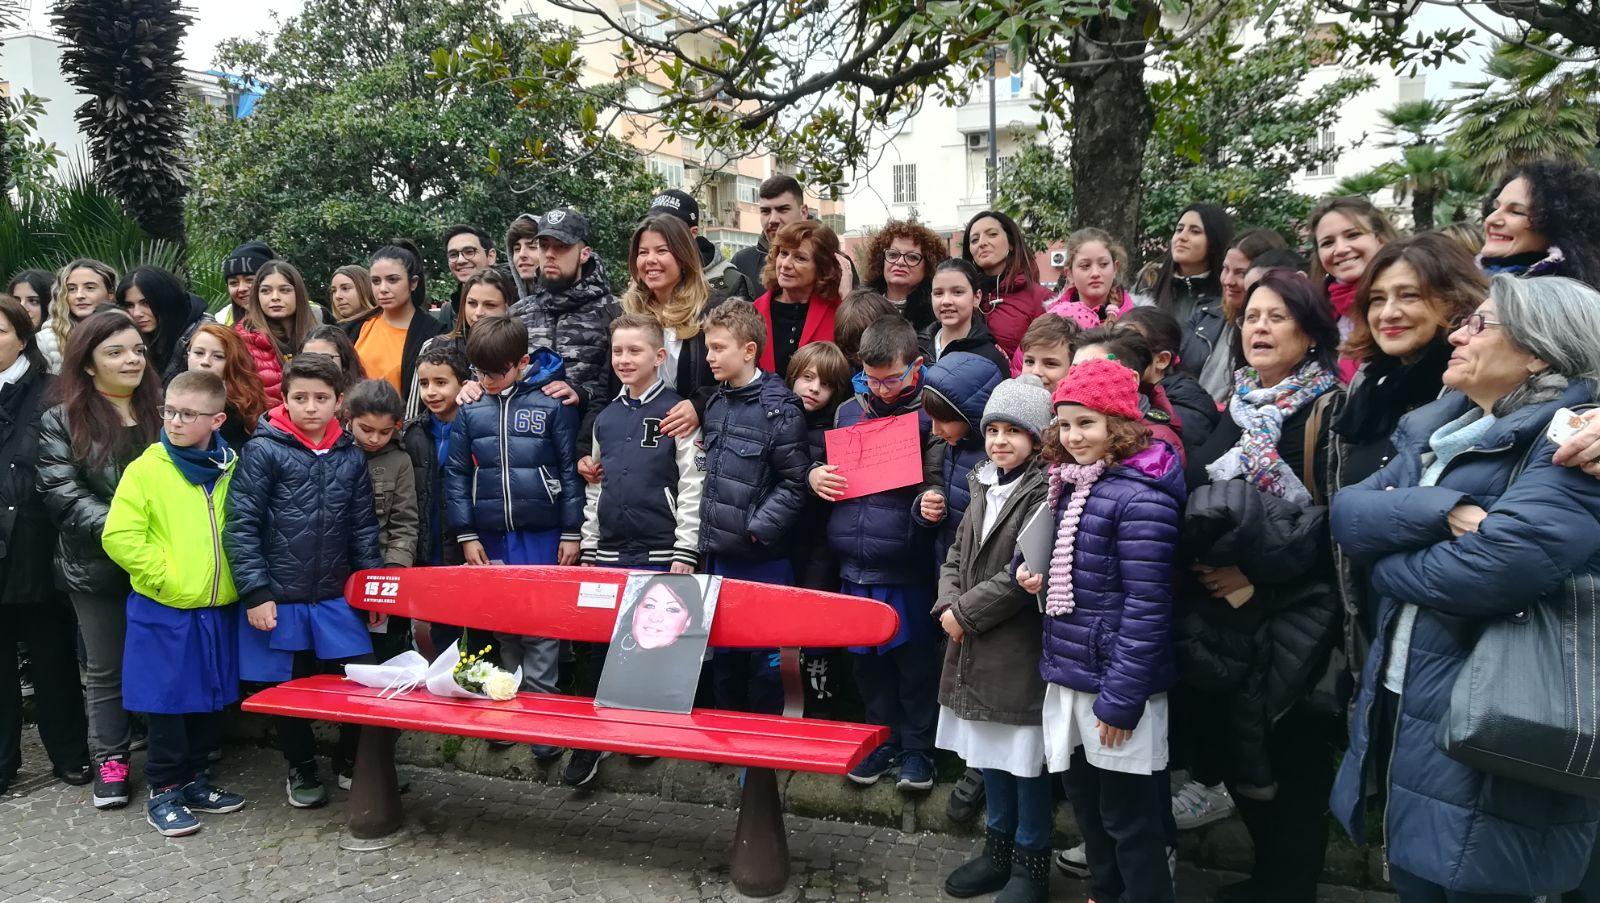 Cus Napoli  Una panchina rossa in Piazza San Vitale